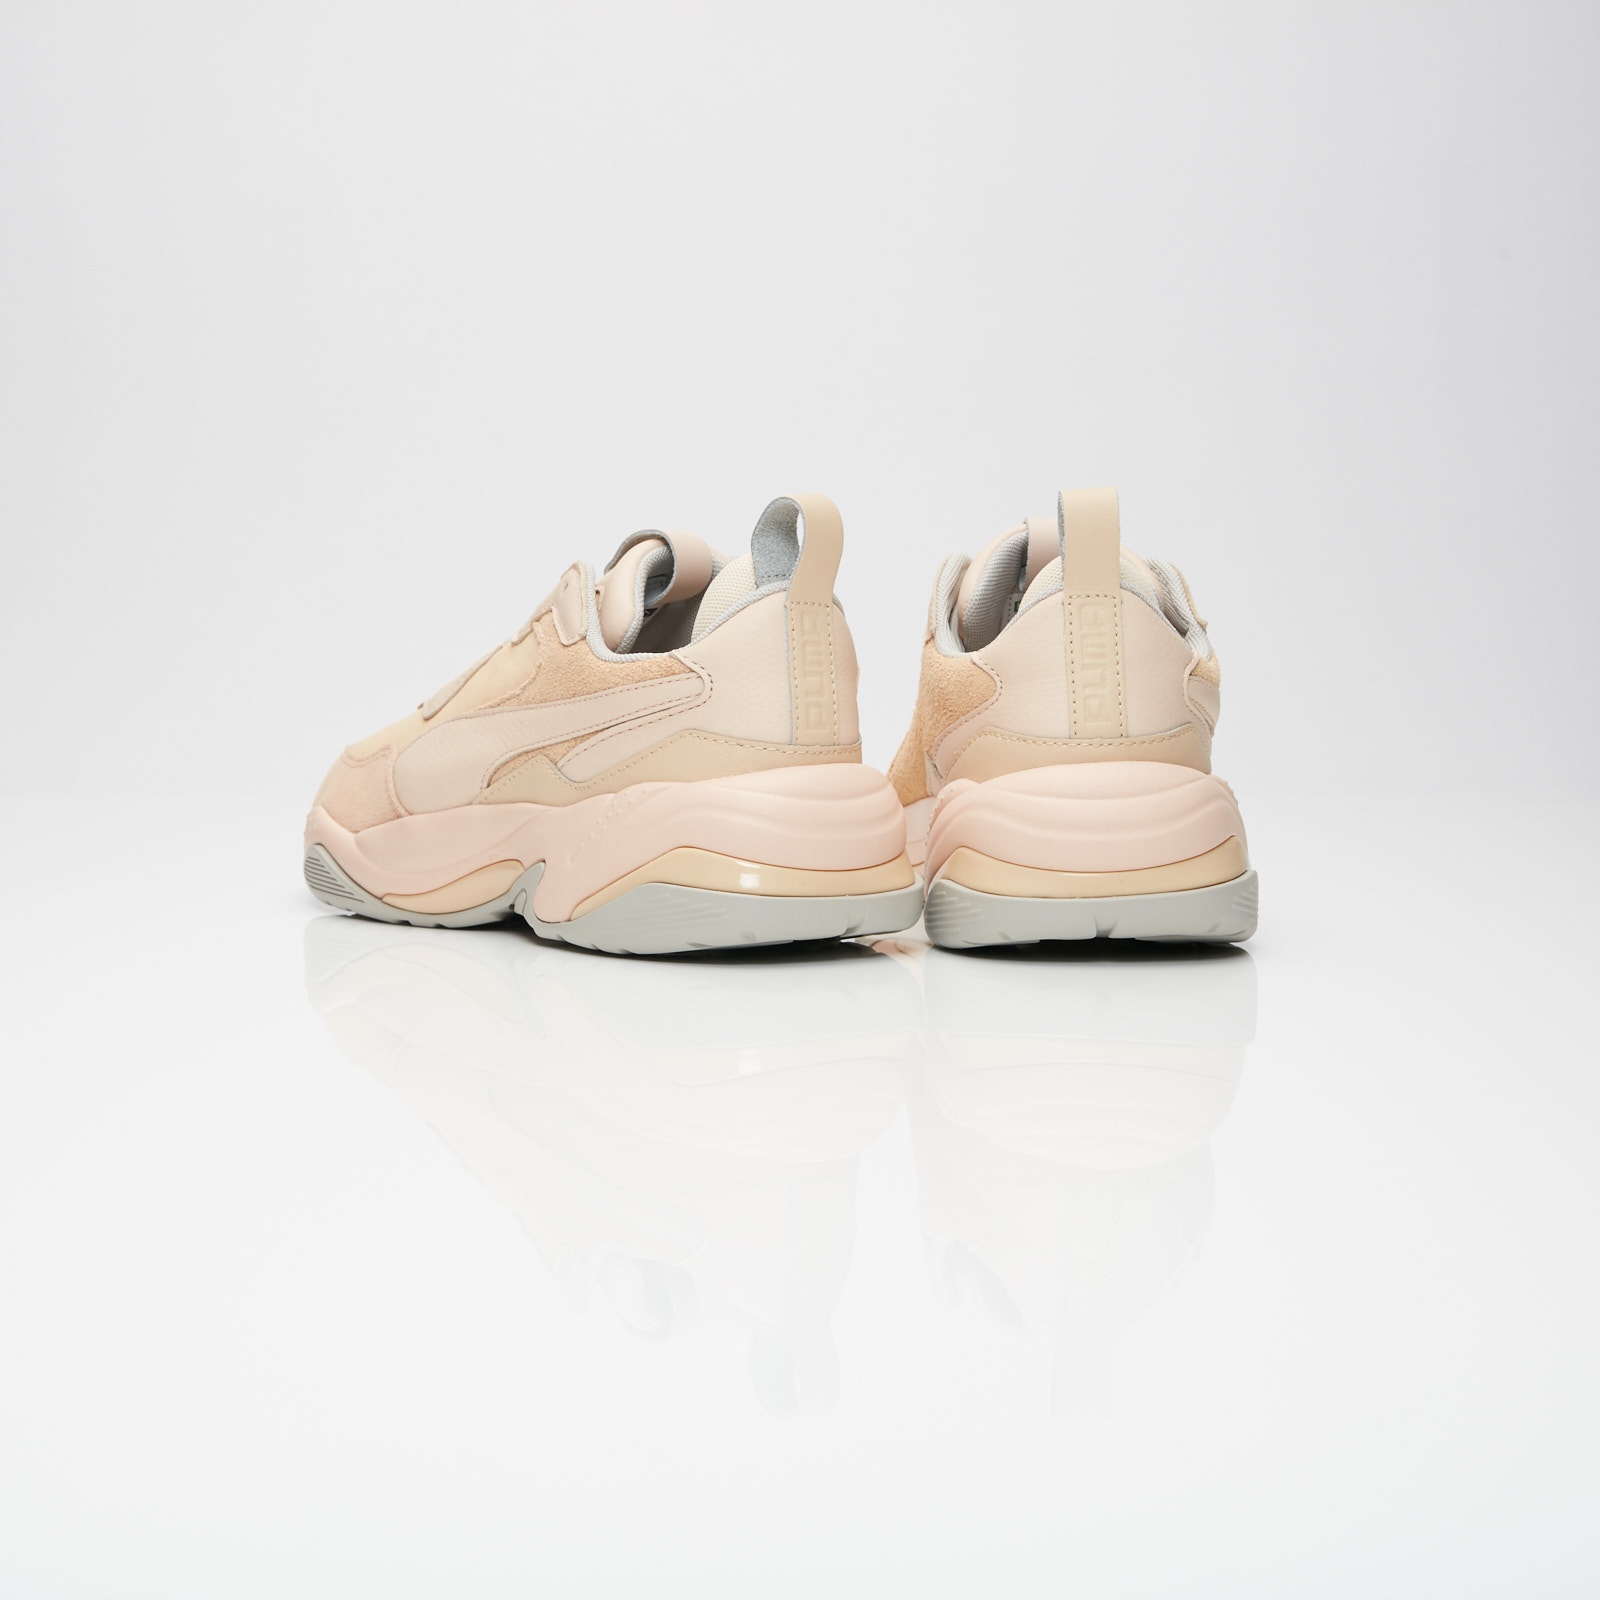 072473c64fa6 Puma Thunder Desert Wmns - 368024-01 - Sneakersnstuff